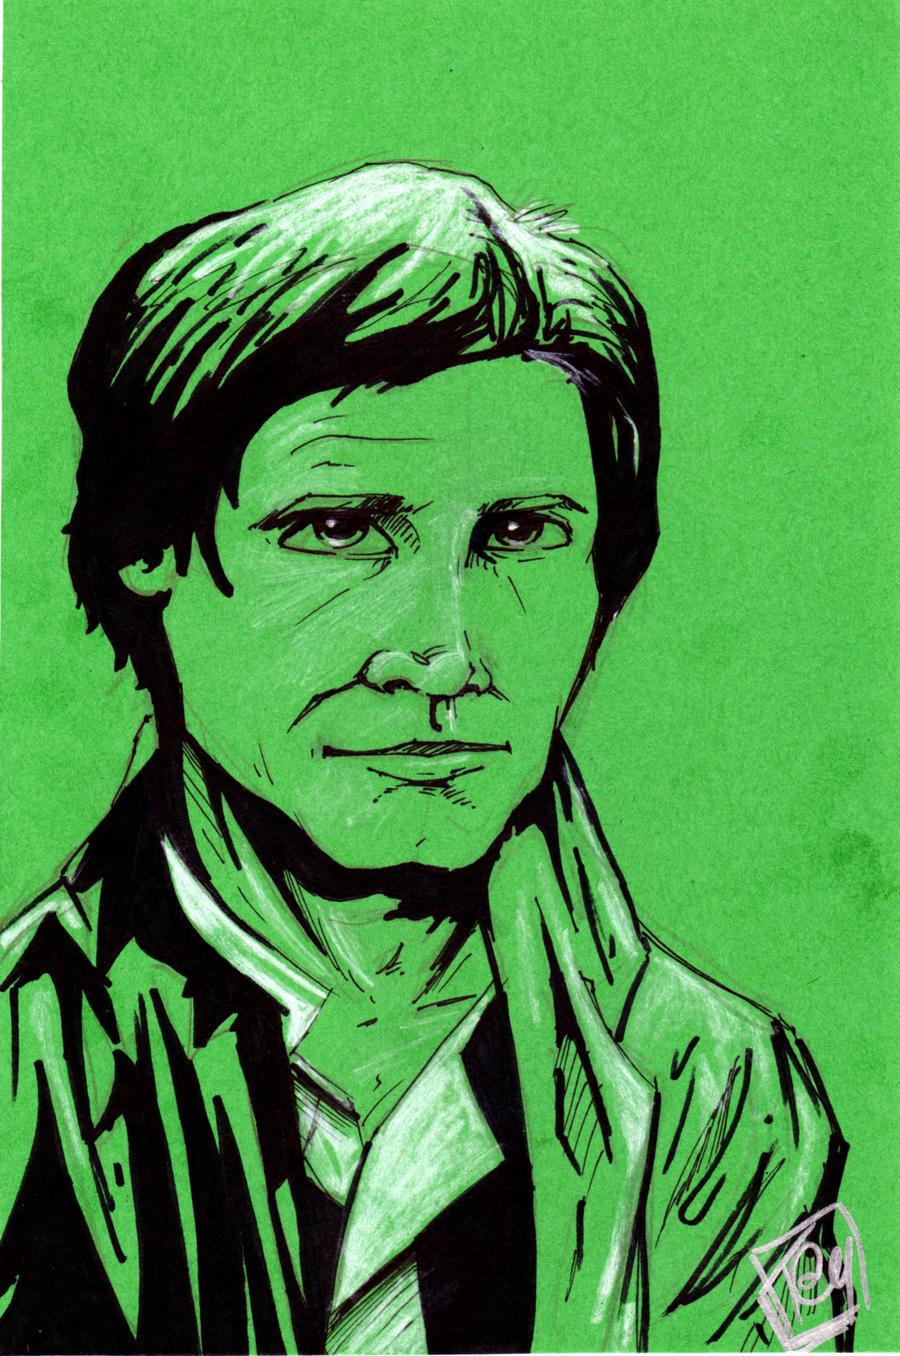 Han Solo in Trench Coat Fan Days commission 2012